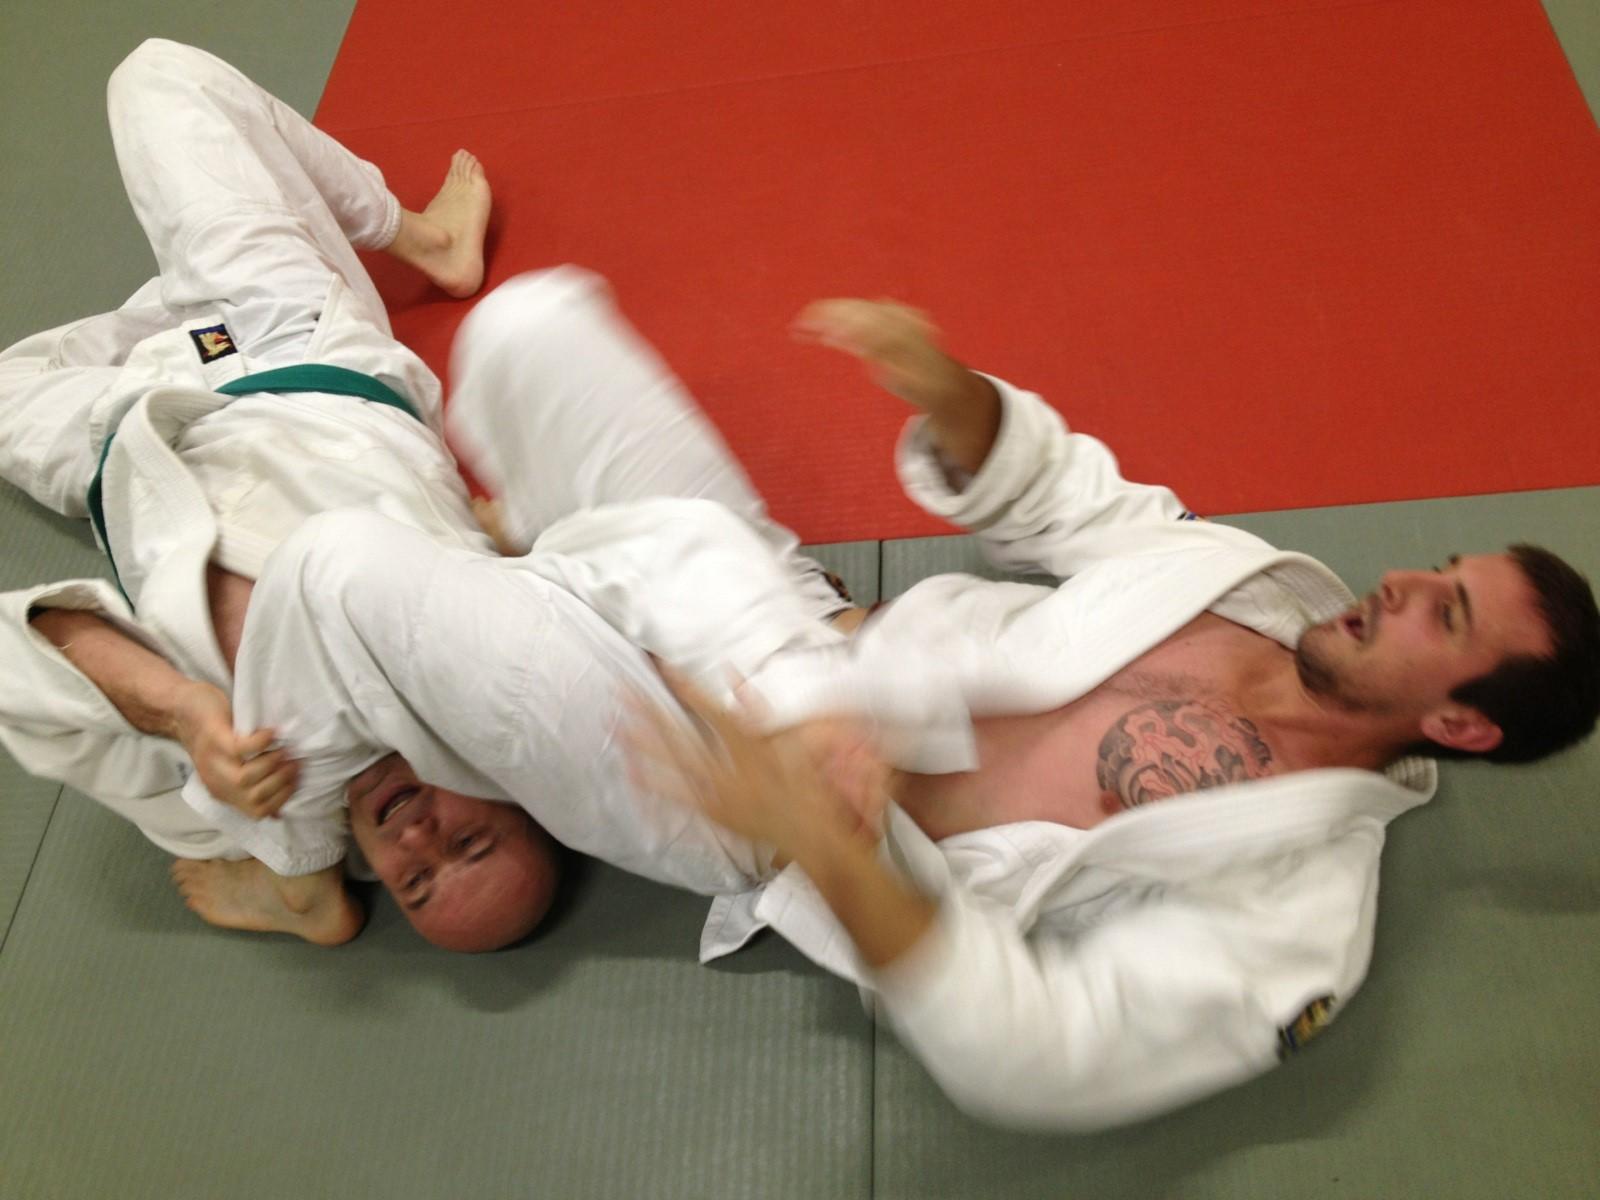 jujitsu-efjjsd-novembre-2013 2